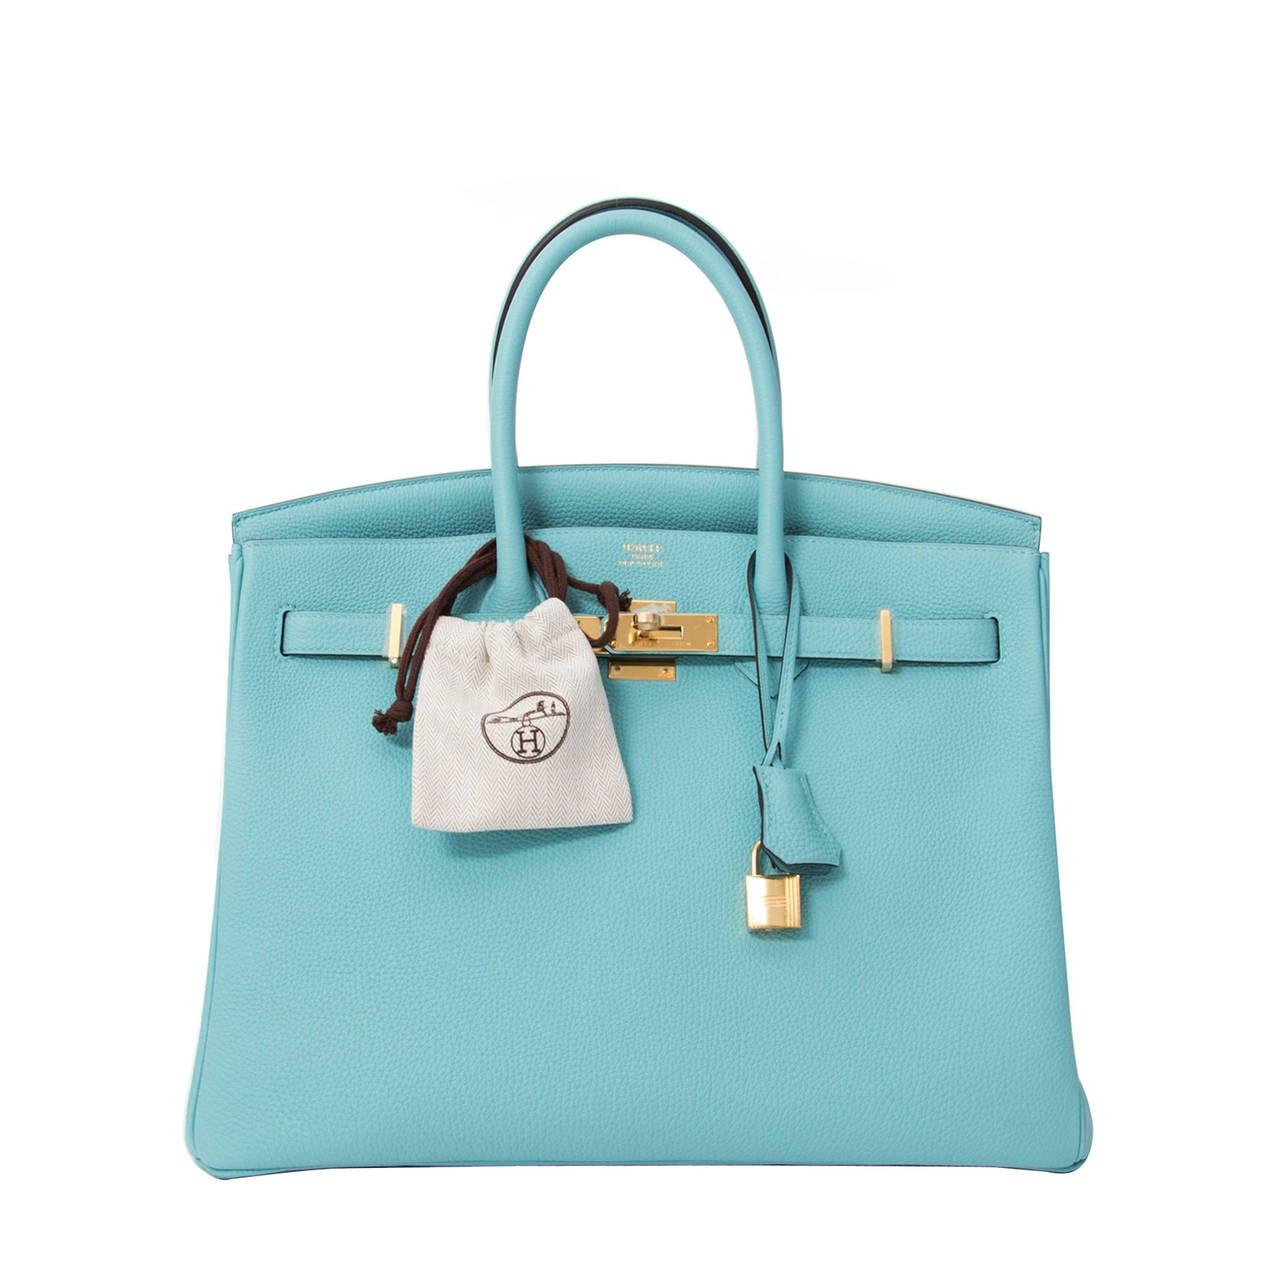 9b3c6c50489d BRAND NEW Hermès Birkin Togo Bleu Atoll GHW 35 at 1stdibs